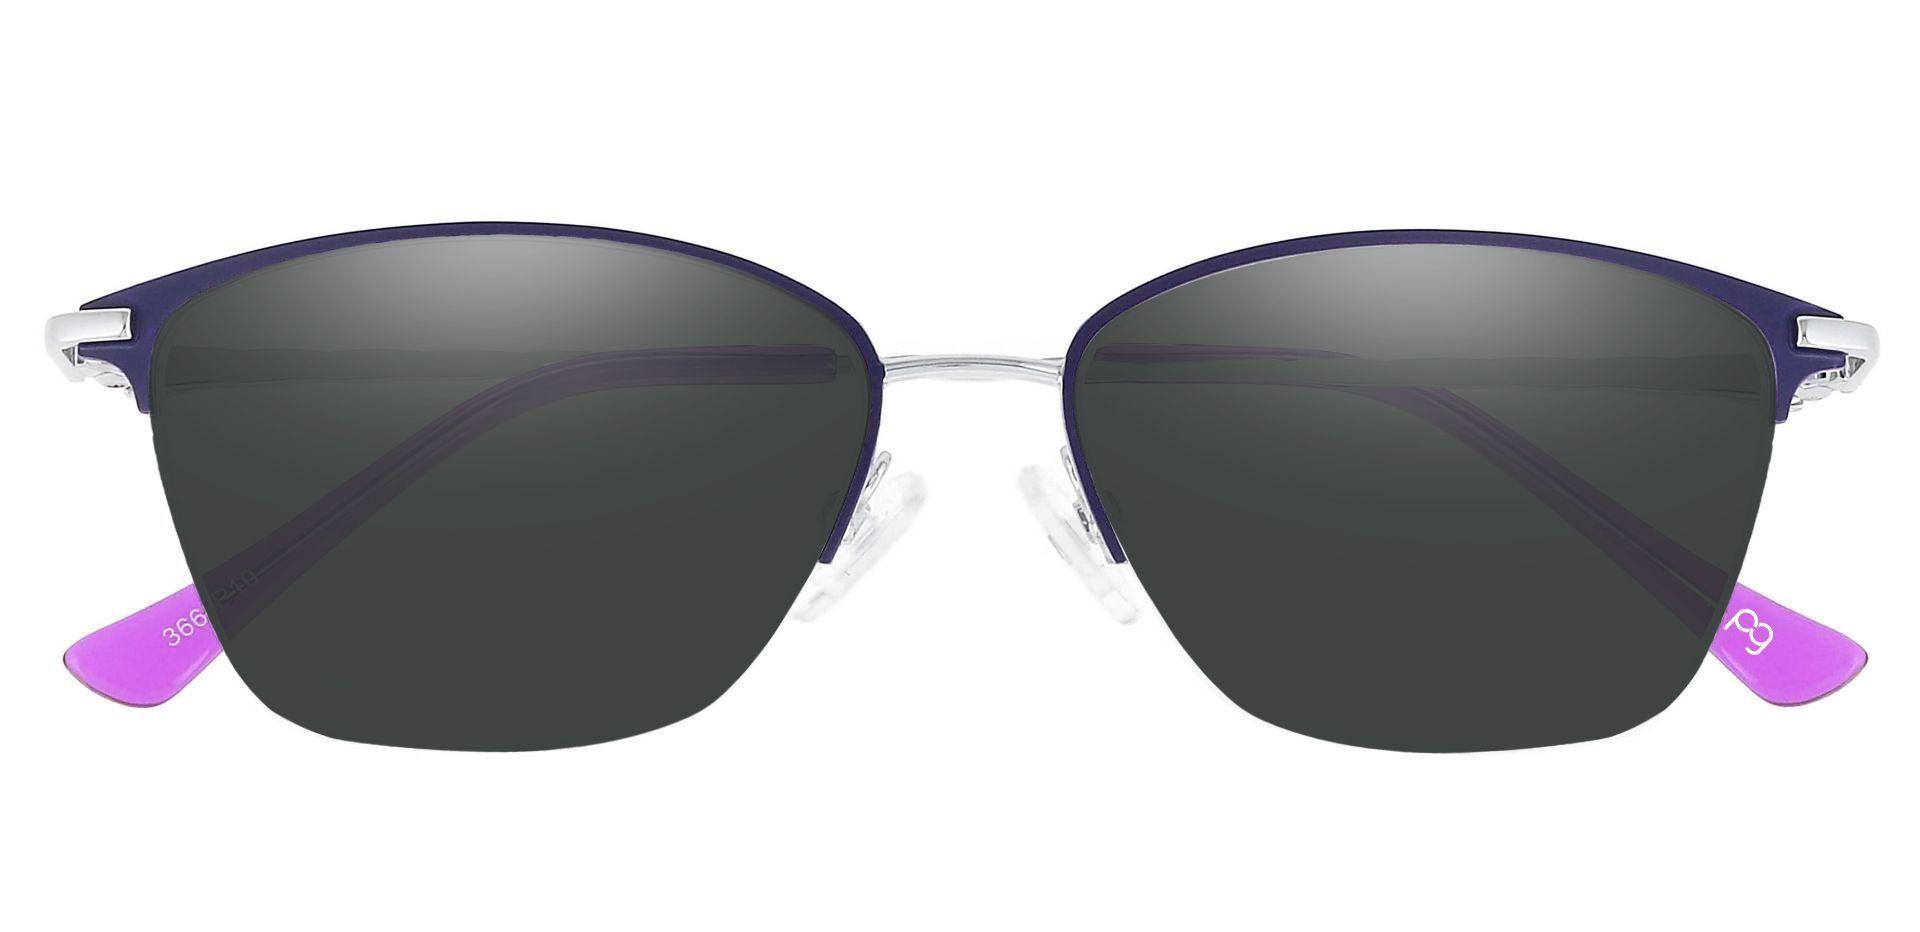 Marigold Rectangle Prescription Sunglasses - Purple Frame With Gray Lenses